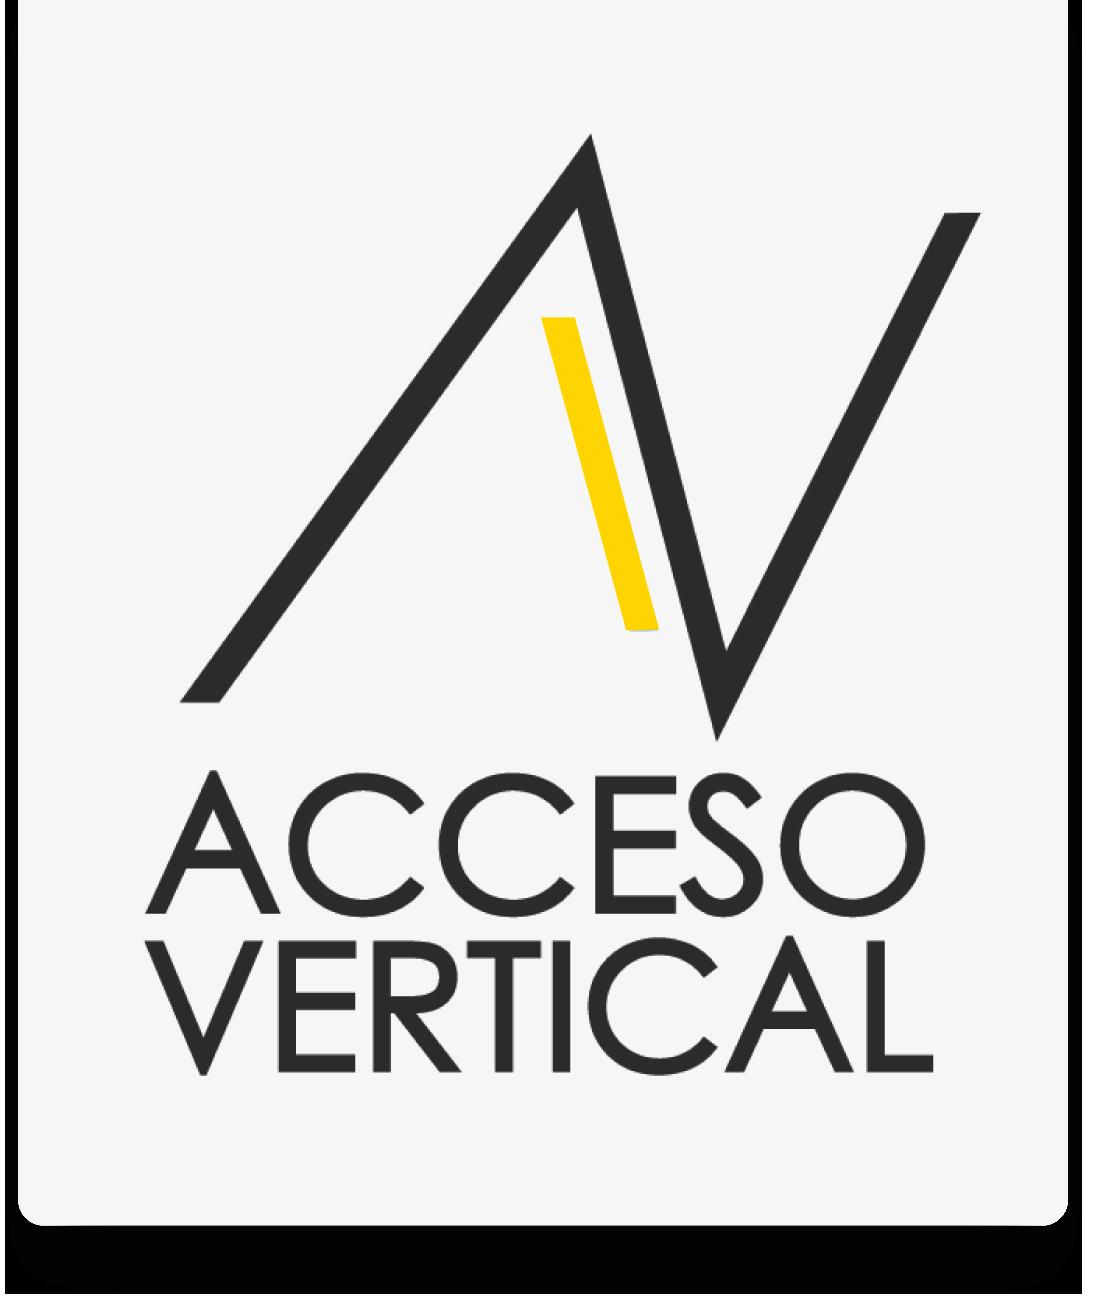 Acceso Vertical